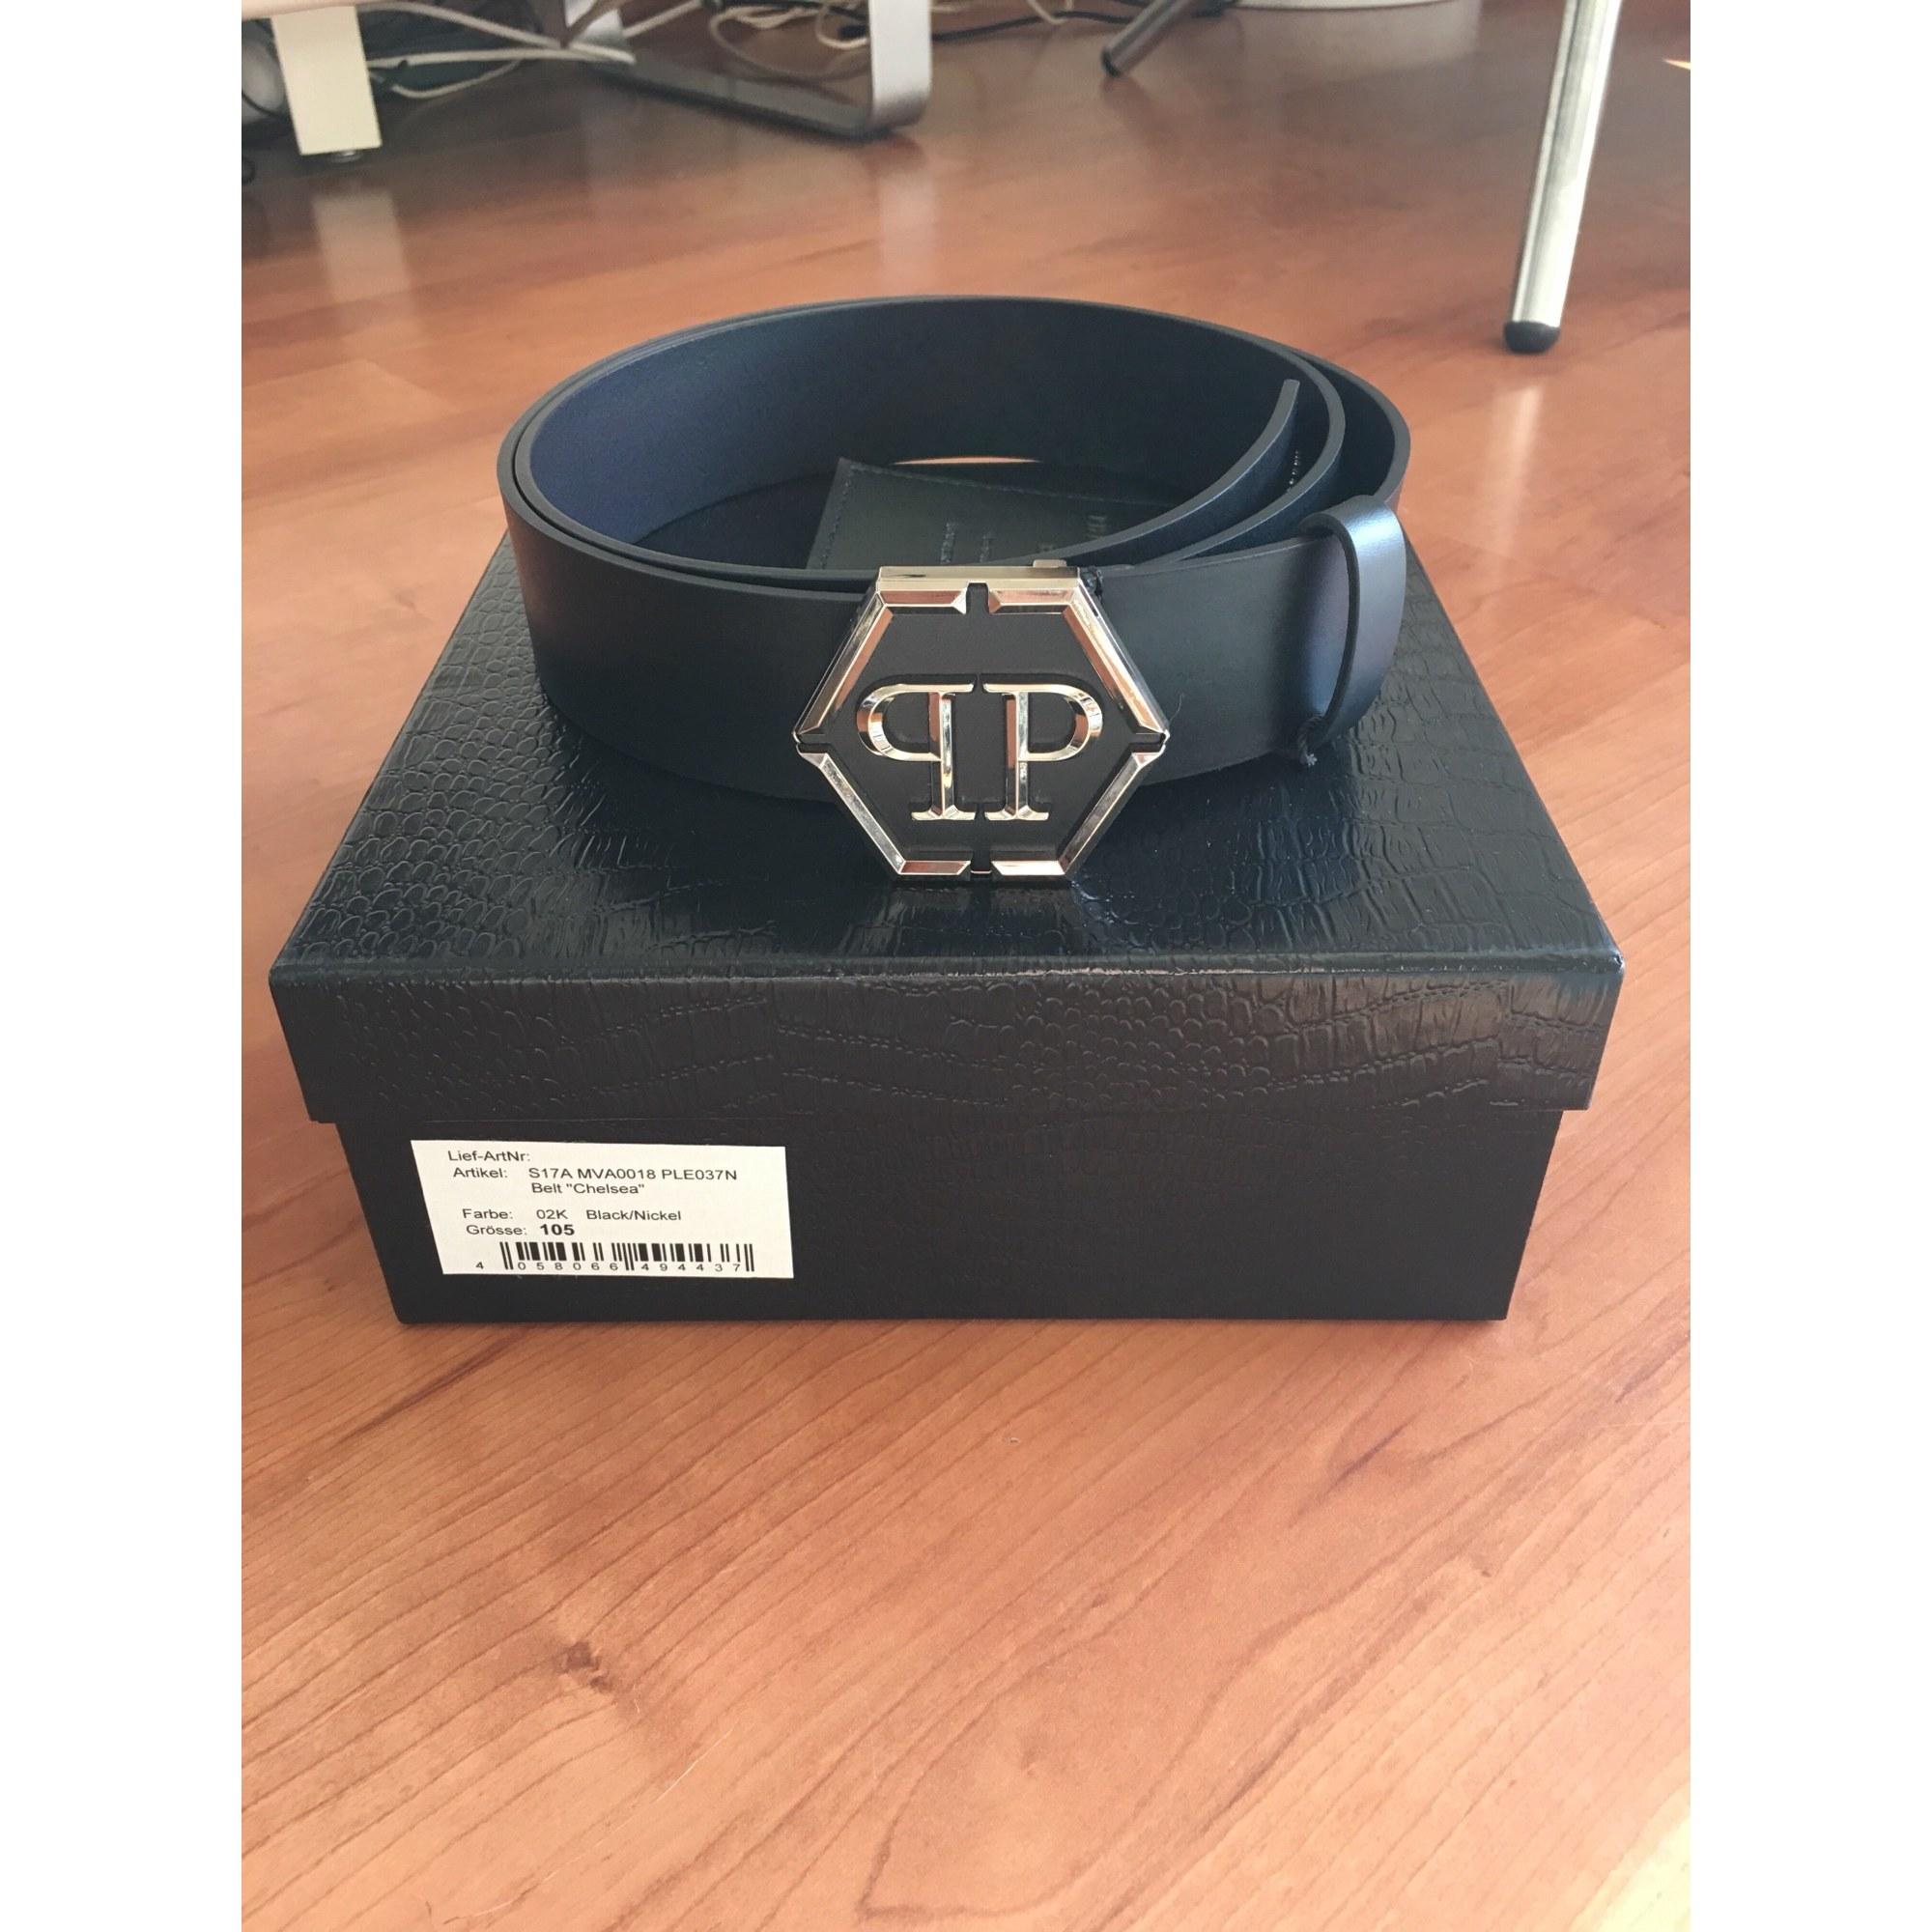 Ceinture PHILIPP PLEIN 105 noir vendu par Adz23 - 6779623 4ab65e1aa68f